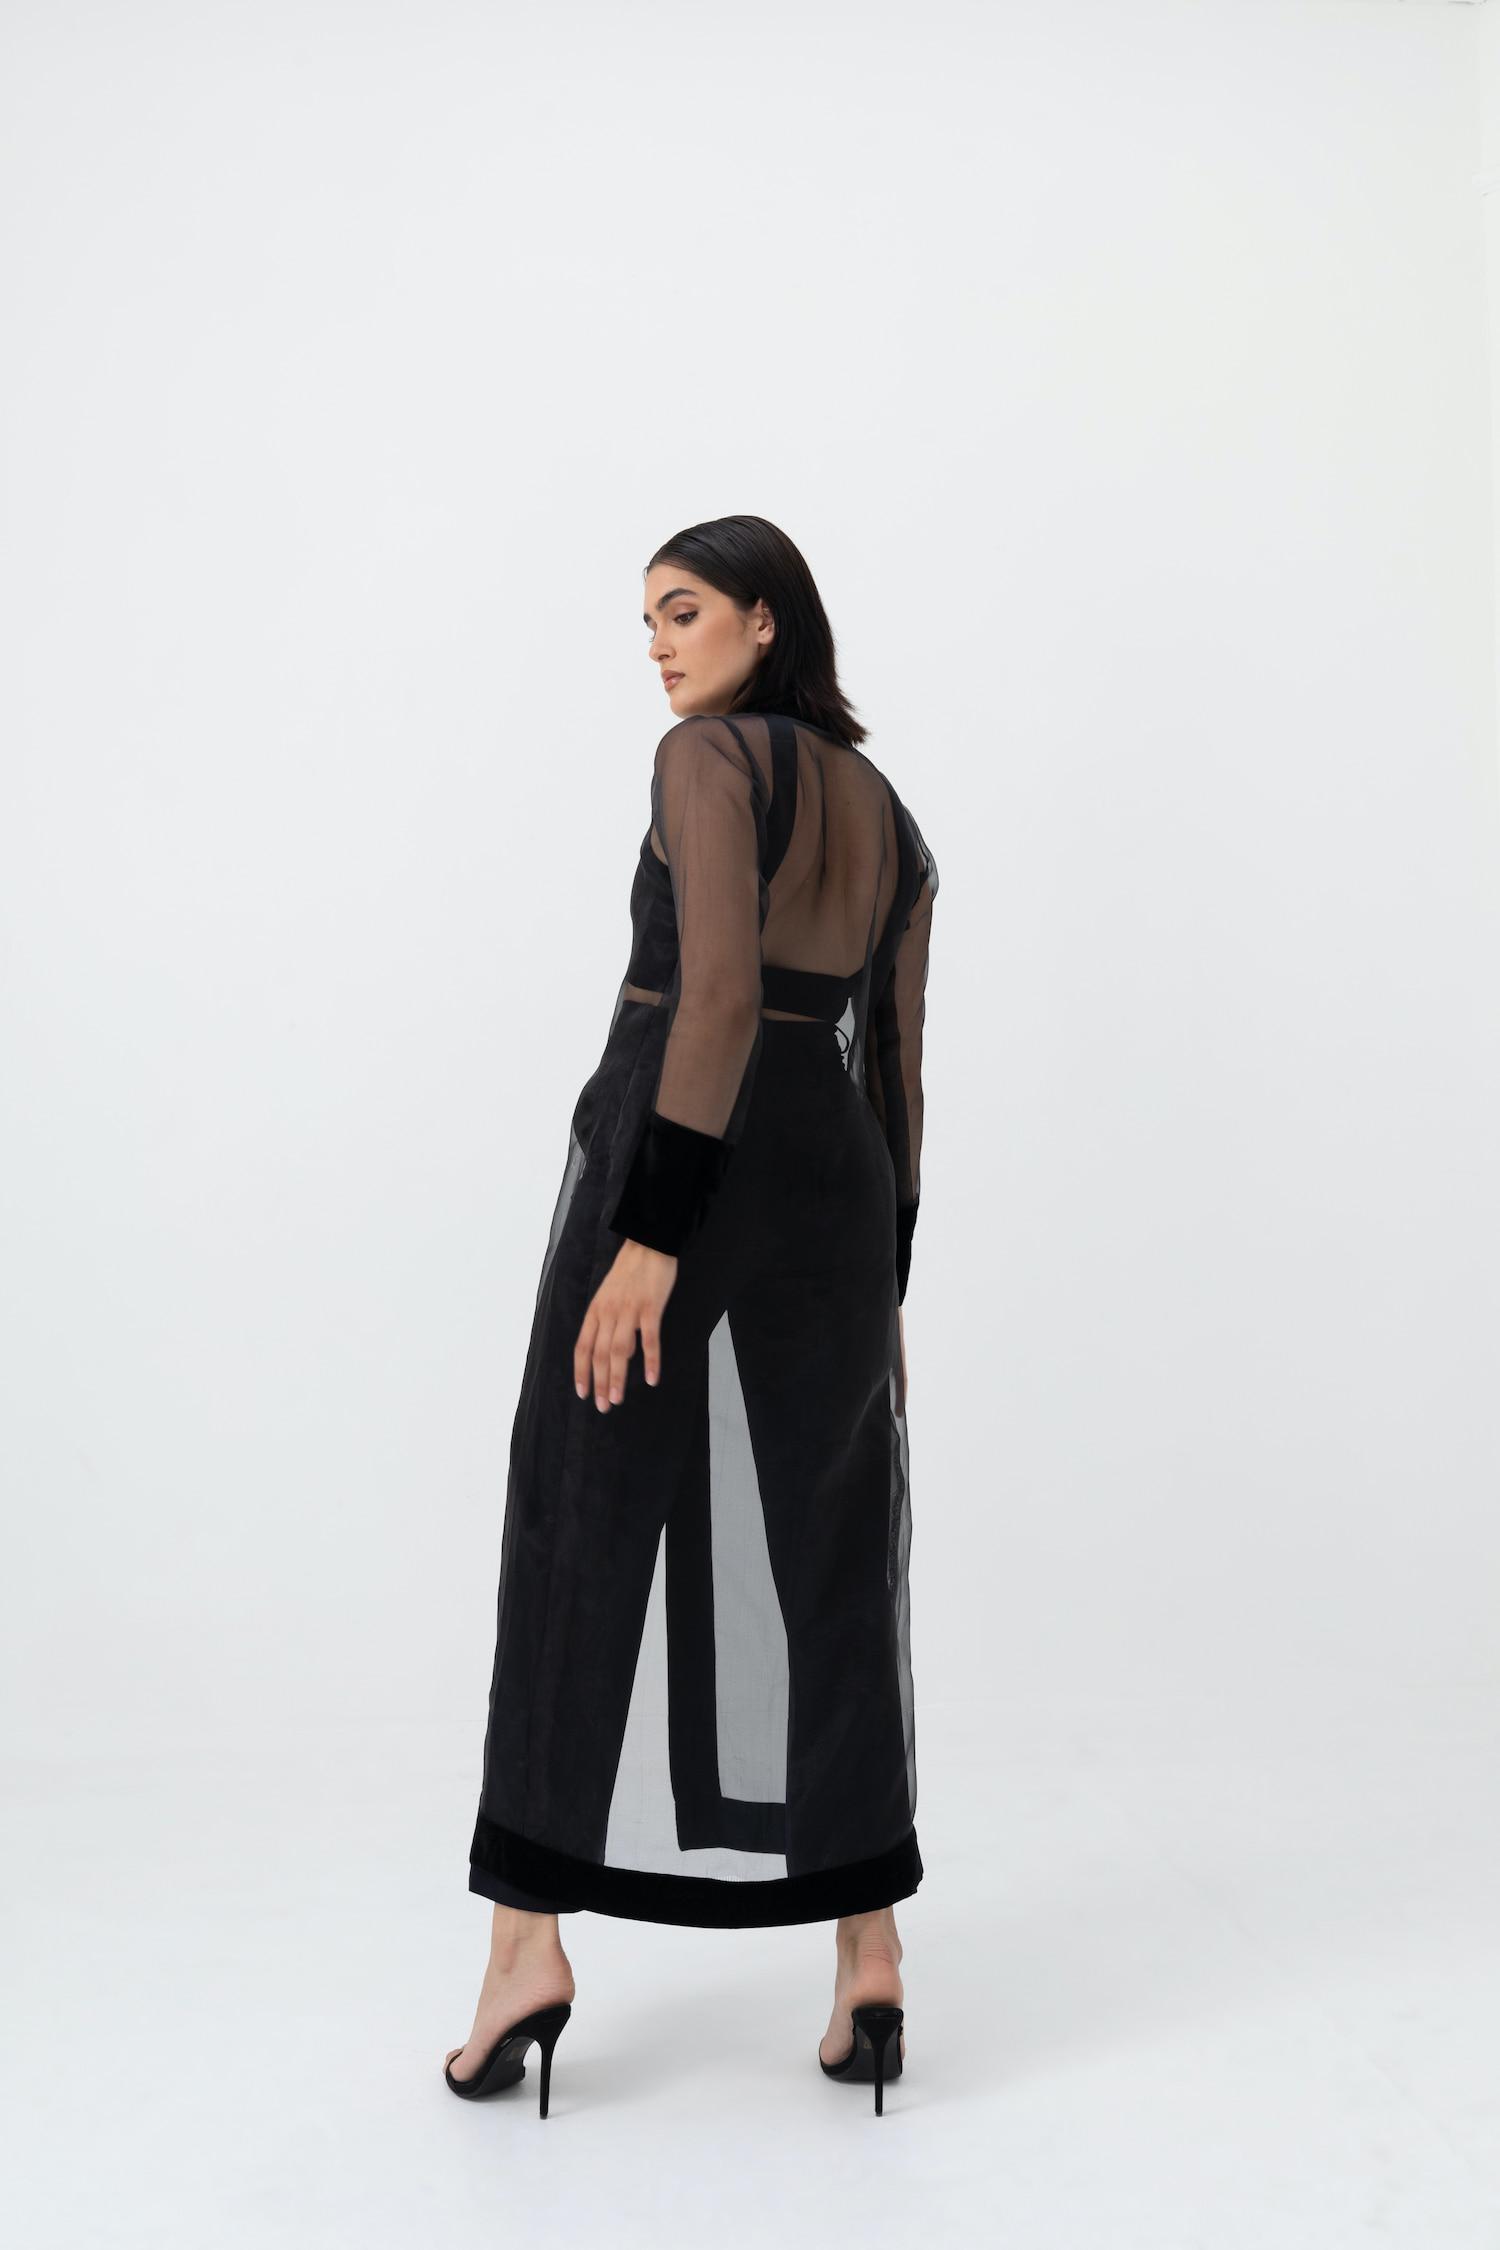 View 2 of model wearing Kiera Kimono in black.